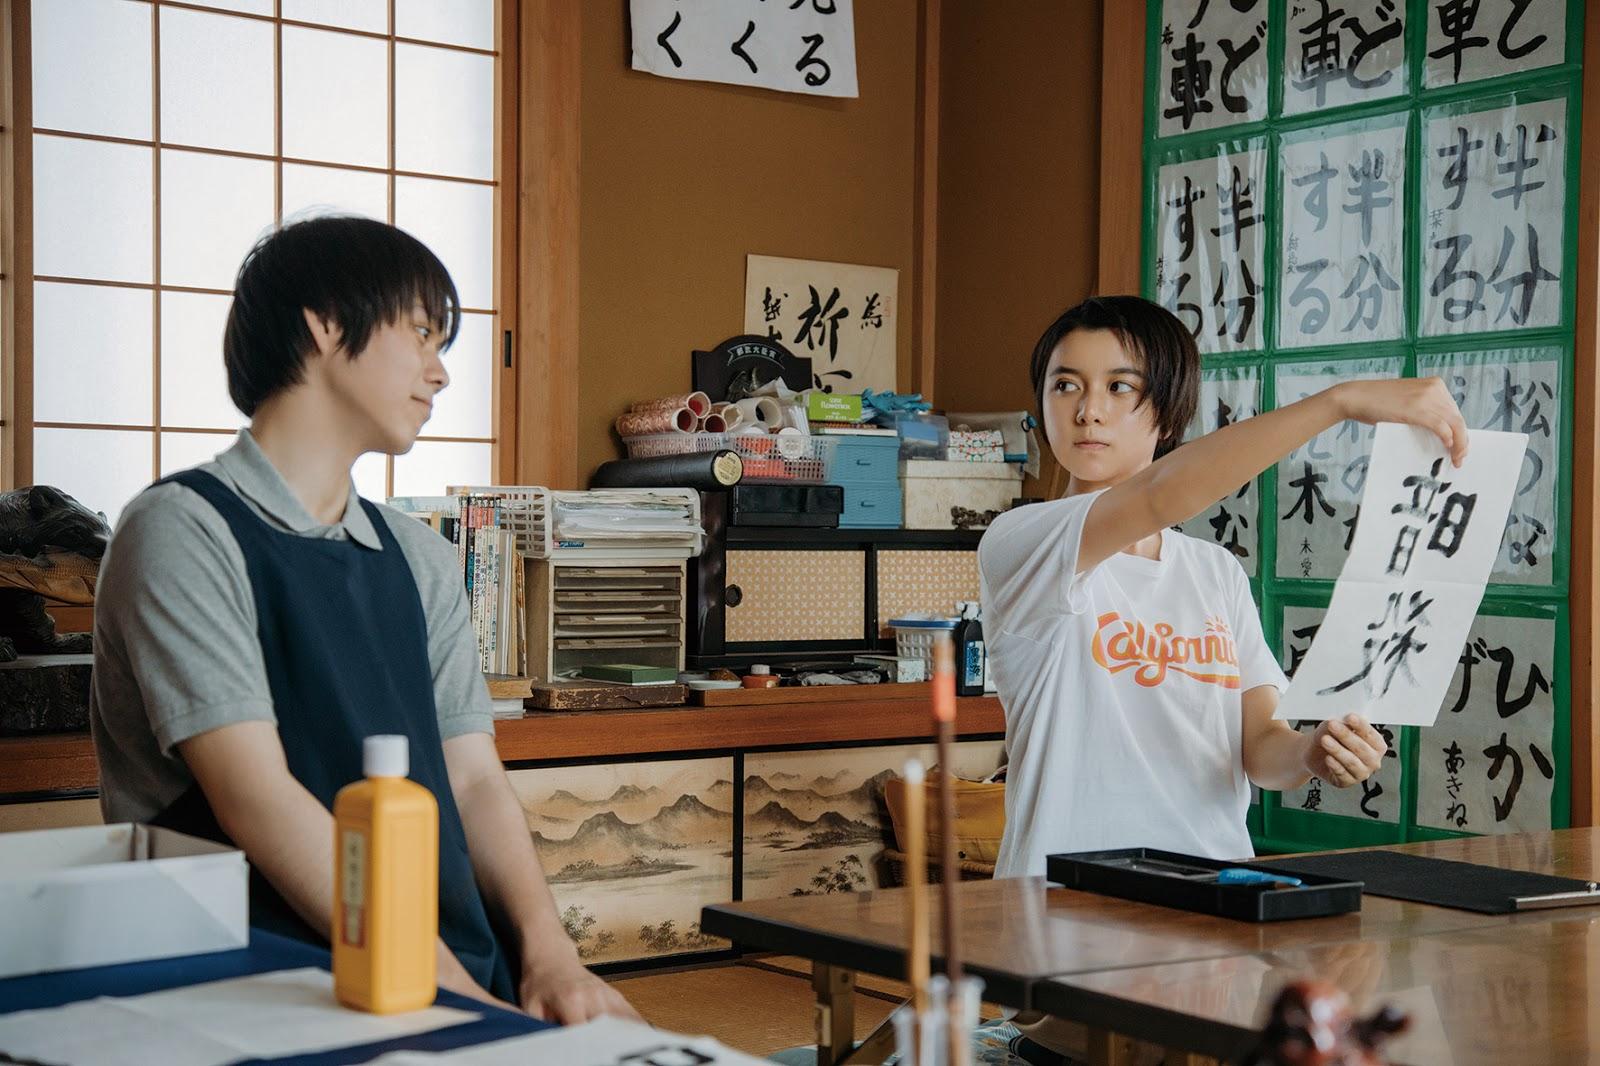 Film Kodomo wa Wakatte Agenai Live-Action Akan Menampilkan Segmen Anime